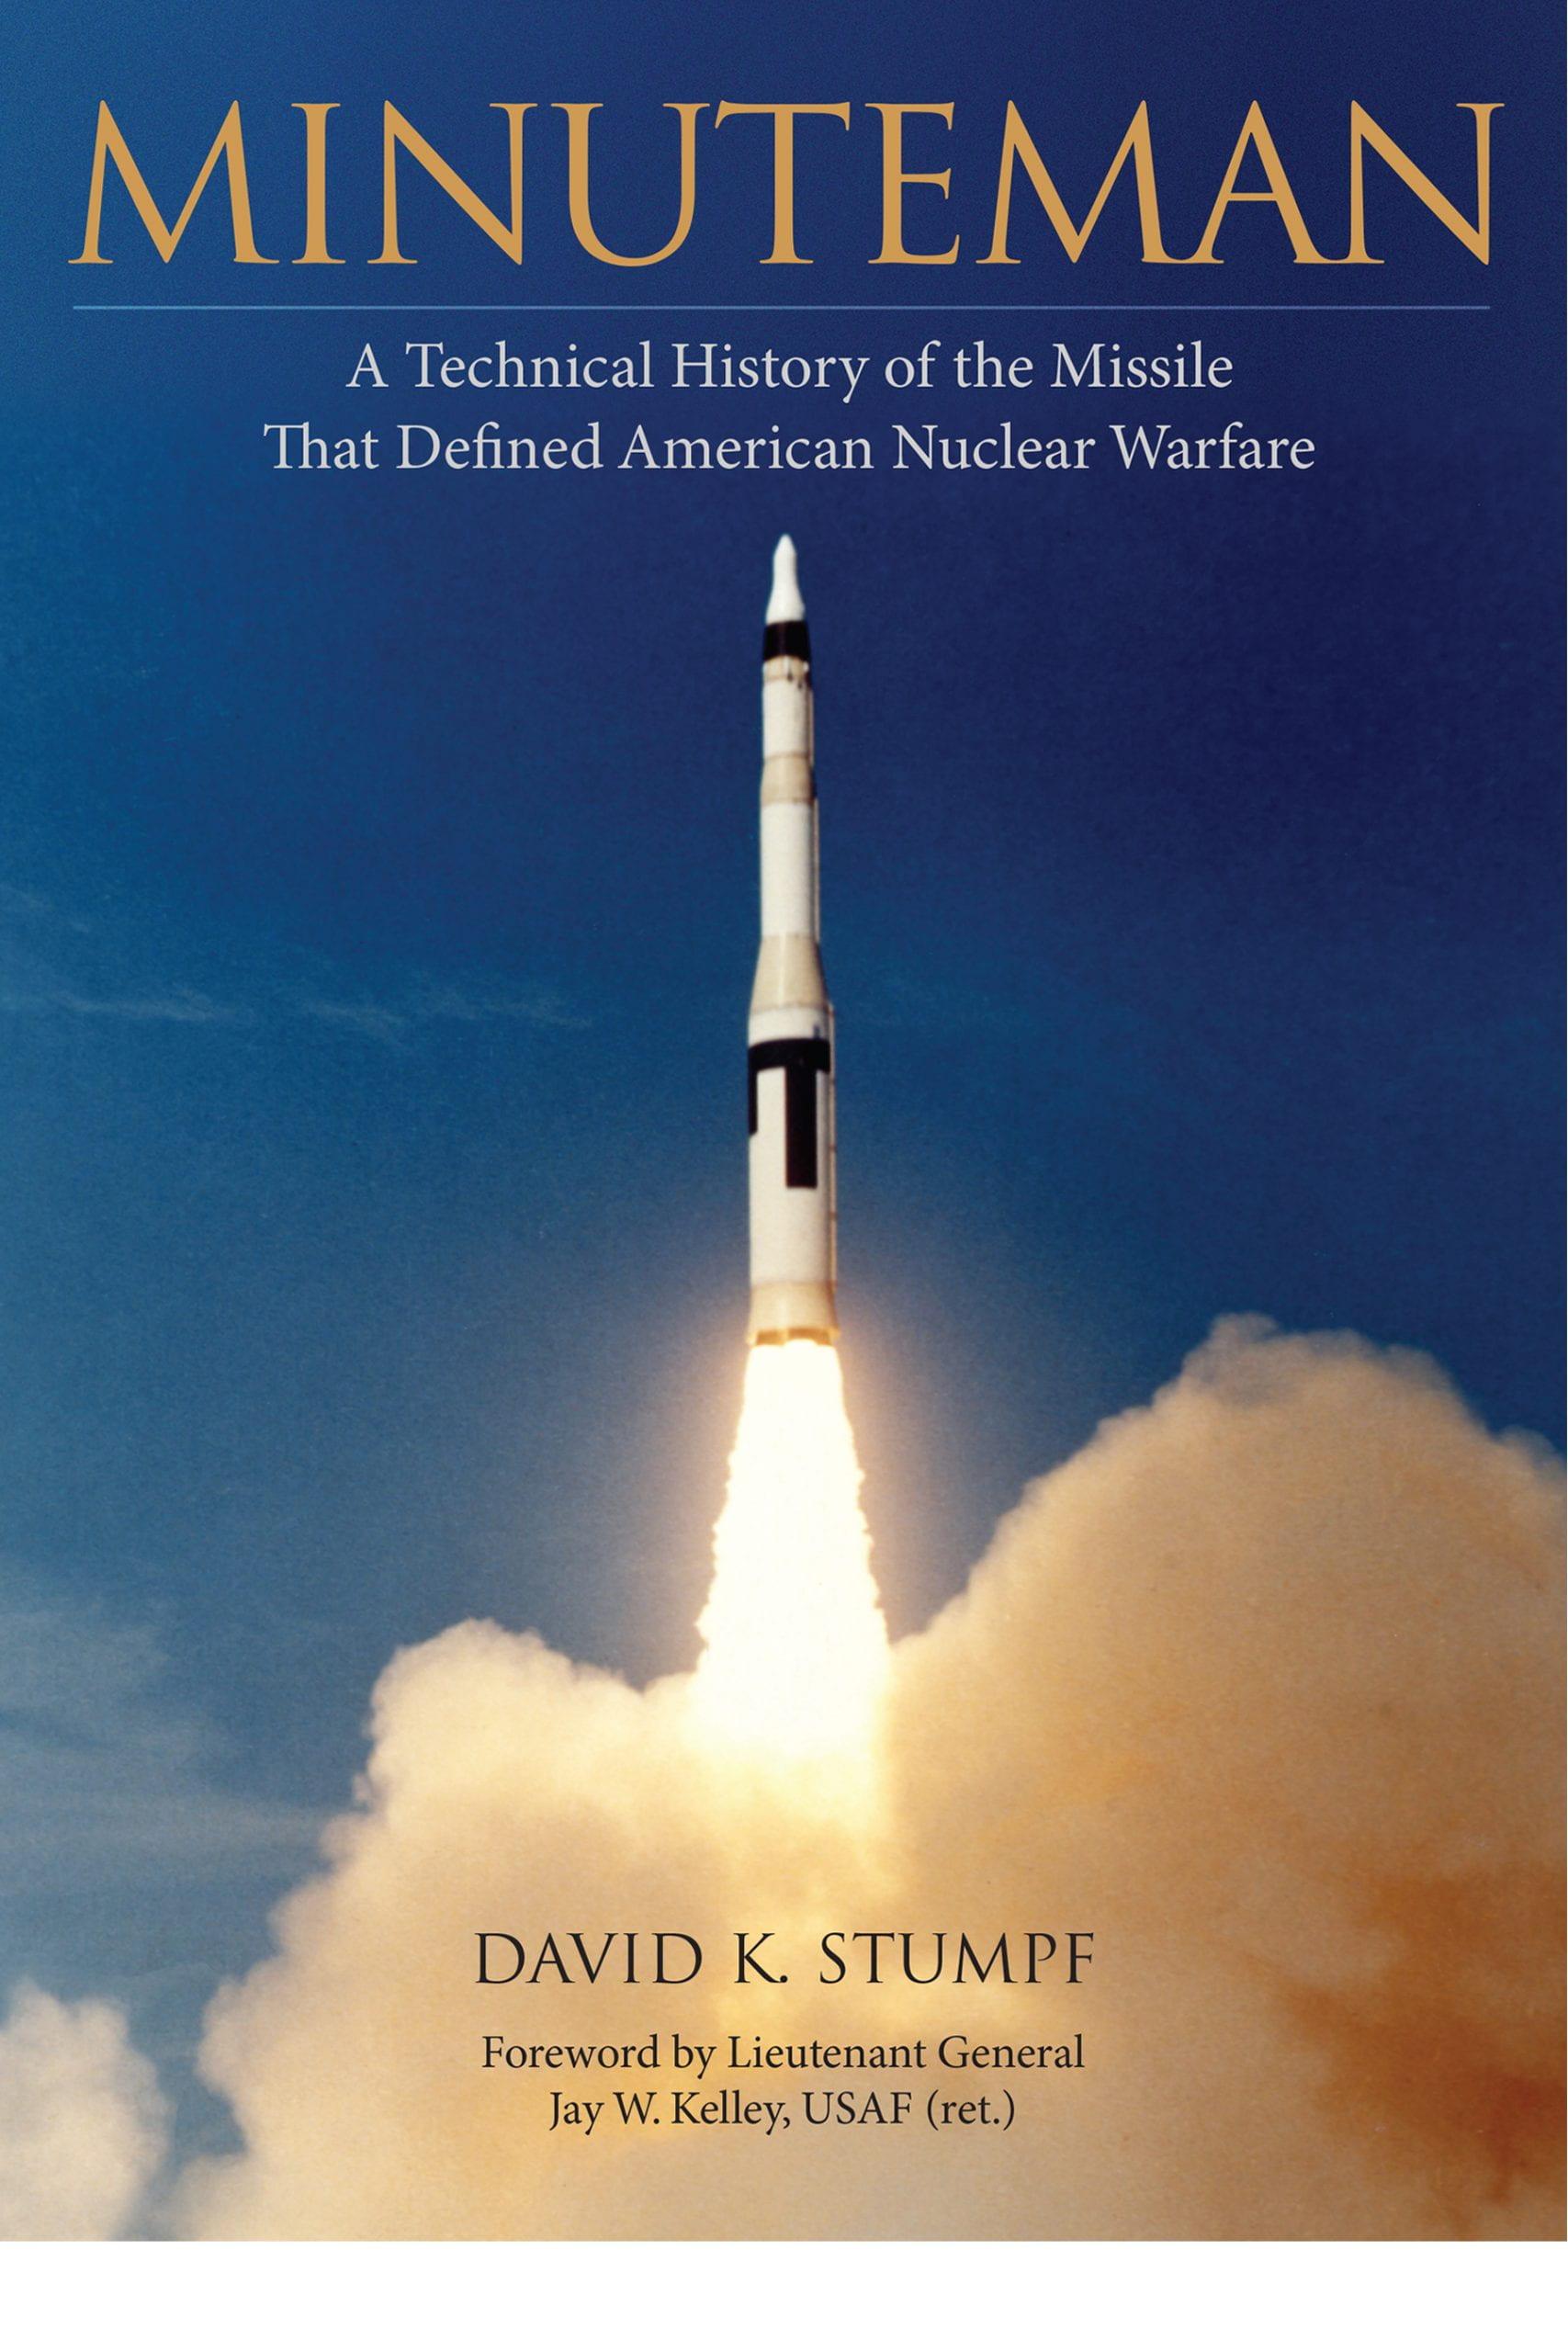 cover of David K. Stumpf's book Minuteman